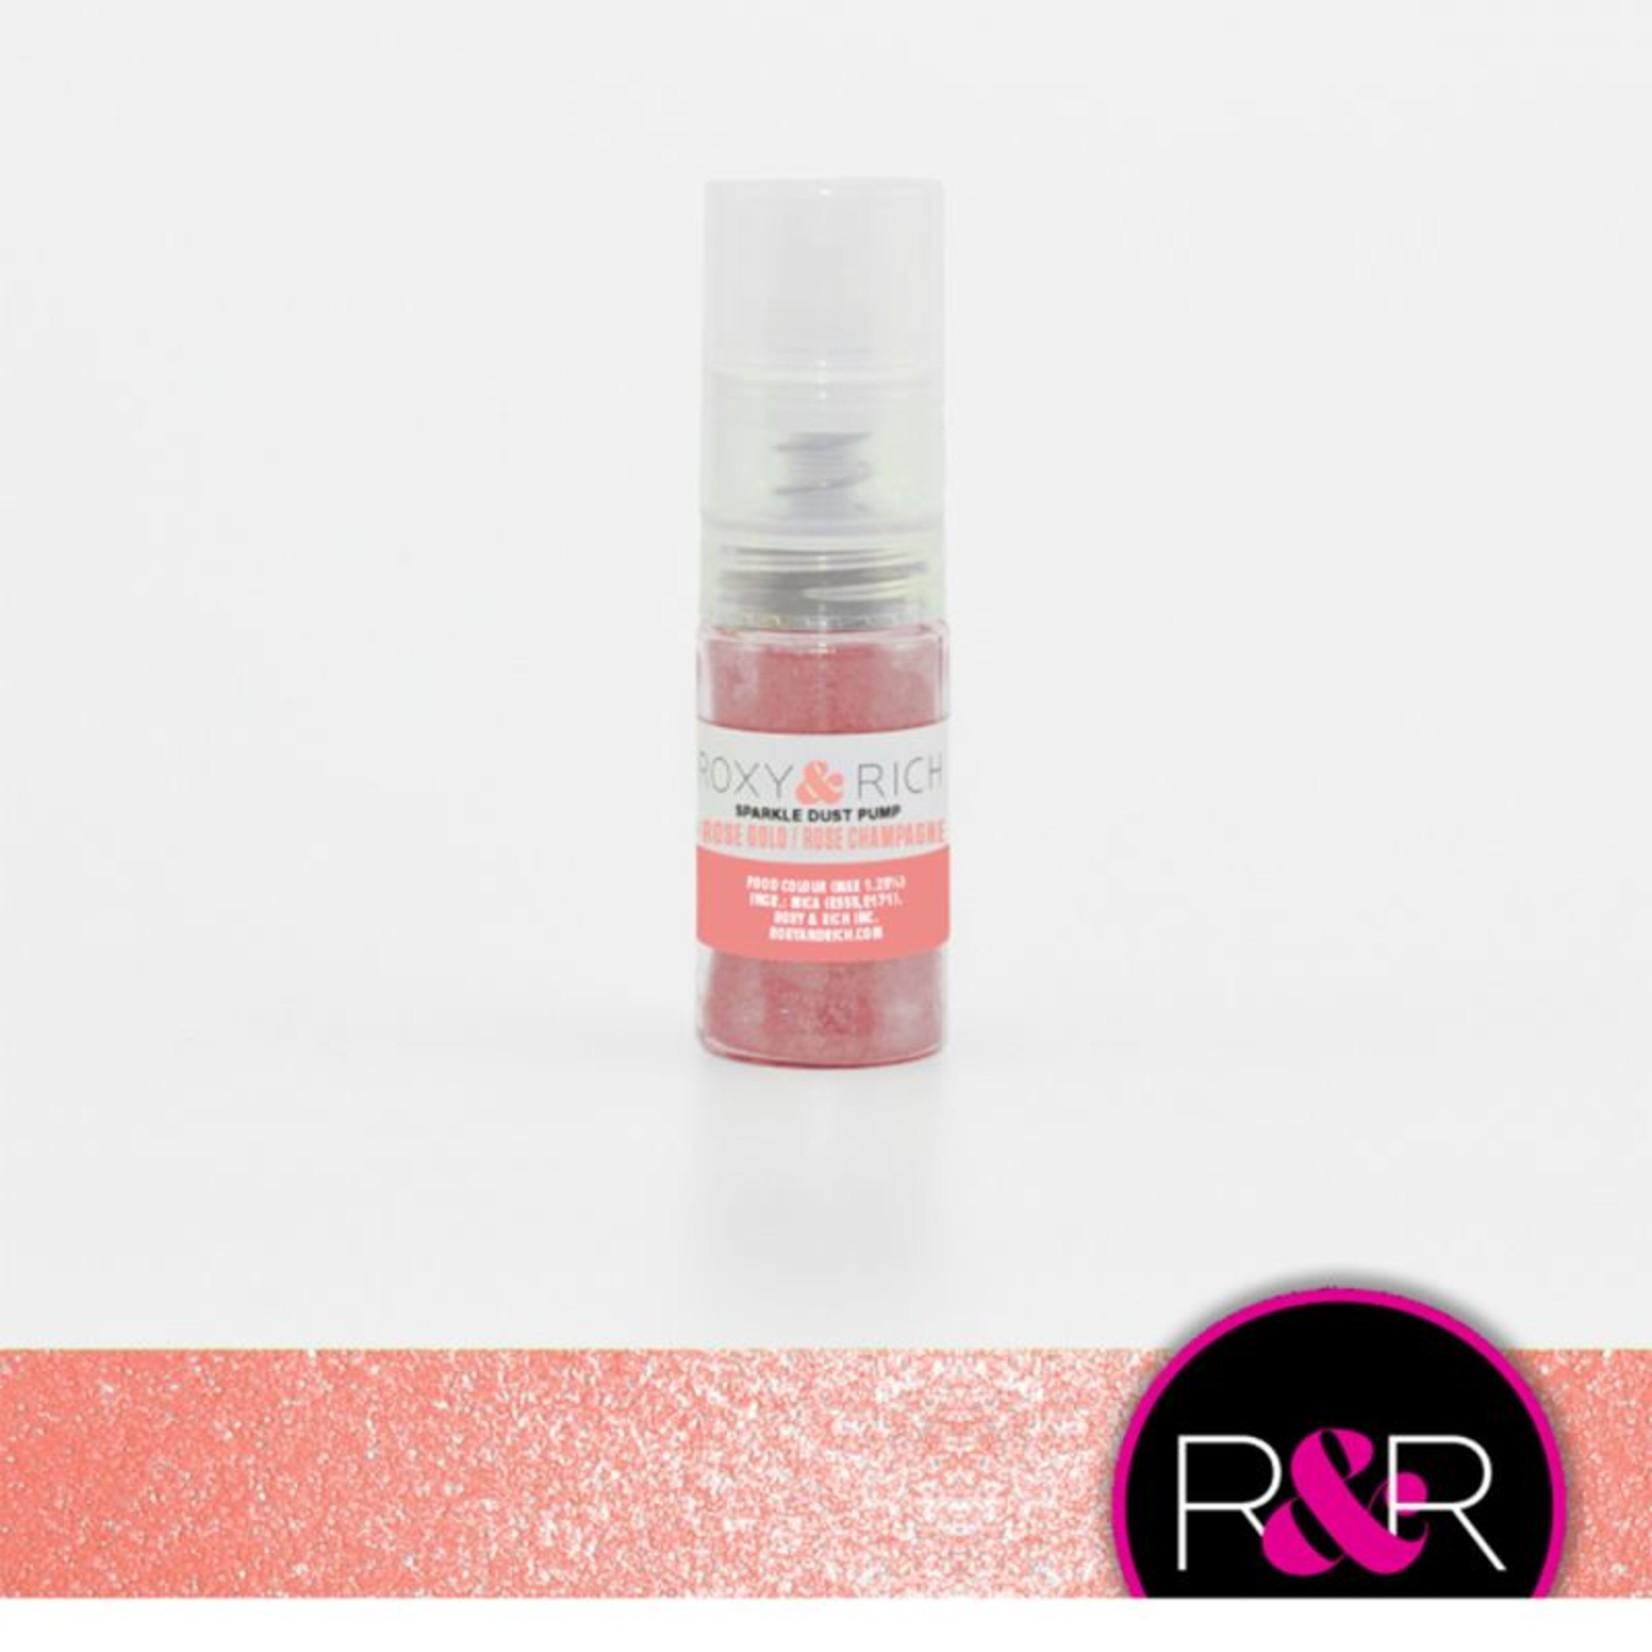 Roxy & Rich Roxy & Rich - Sparkle Dust Pump, Rose Gold - 4g, S4-054P